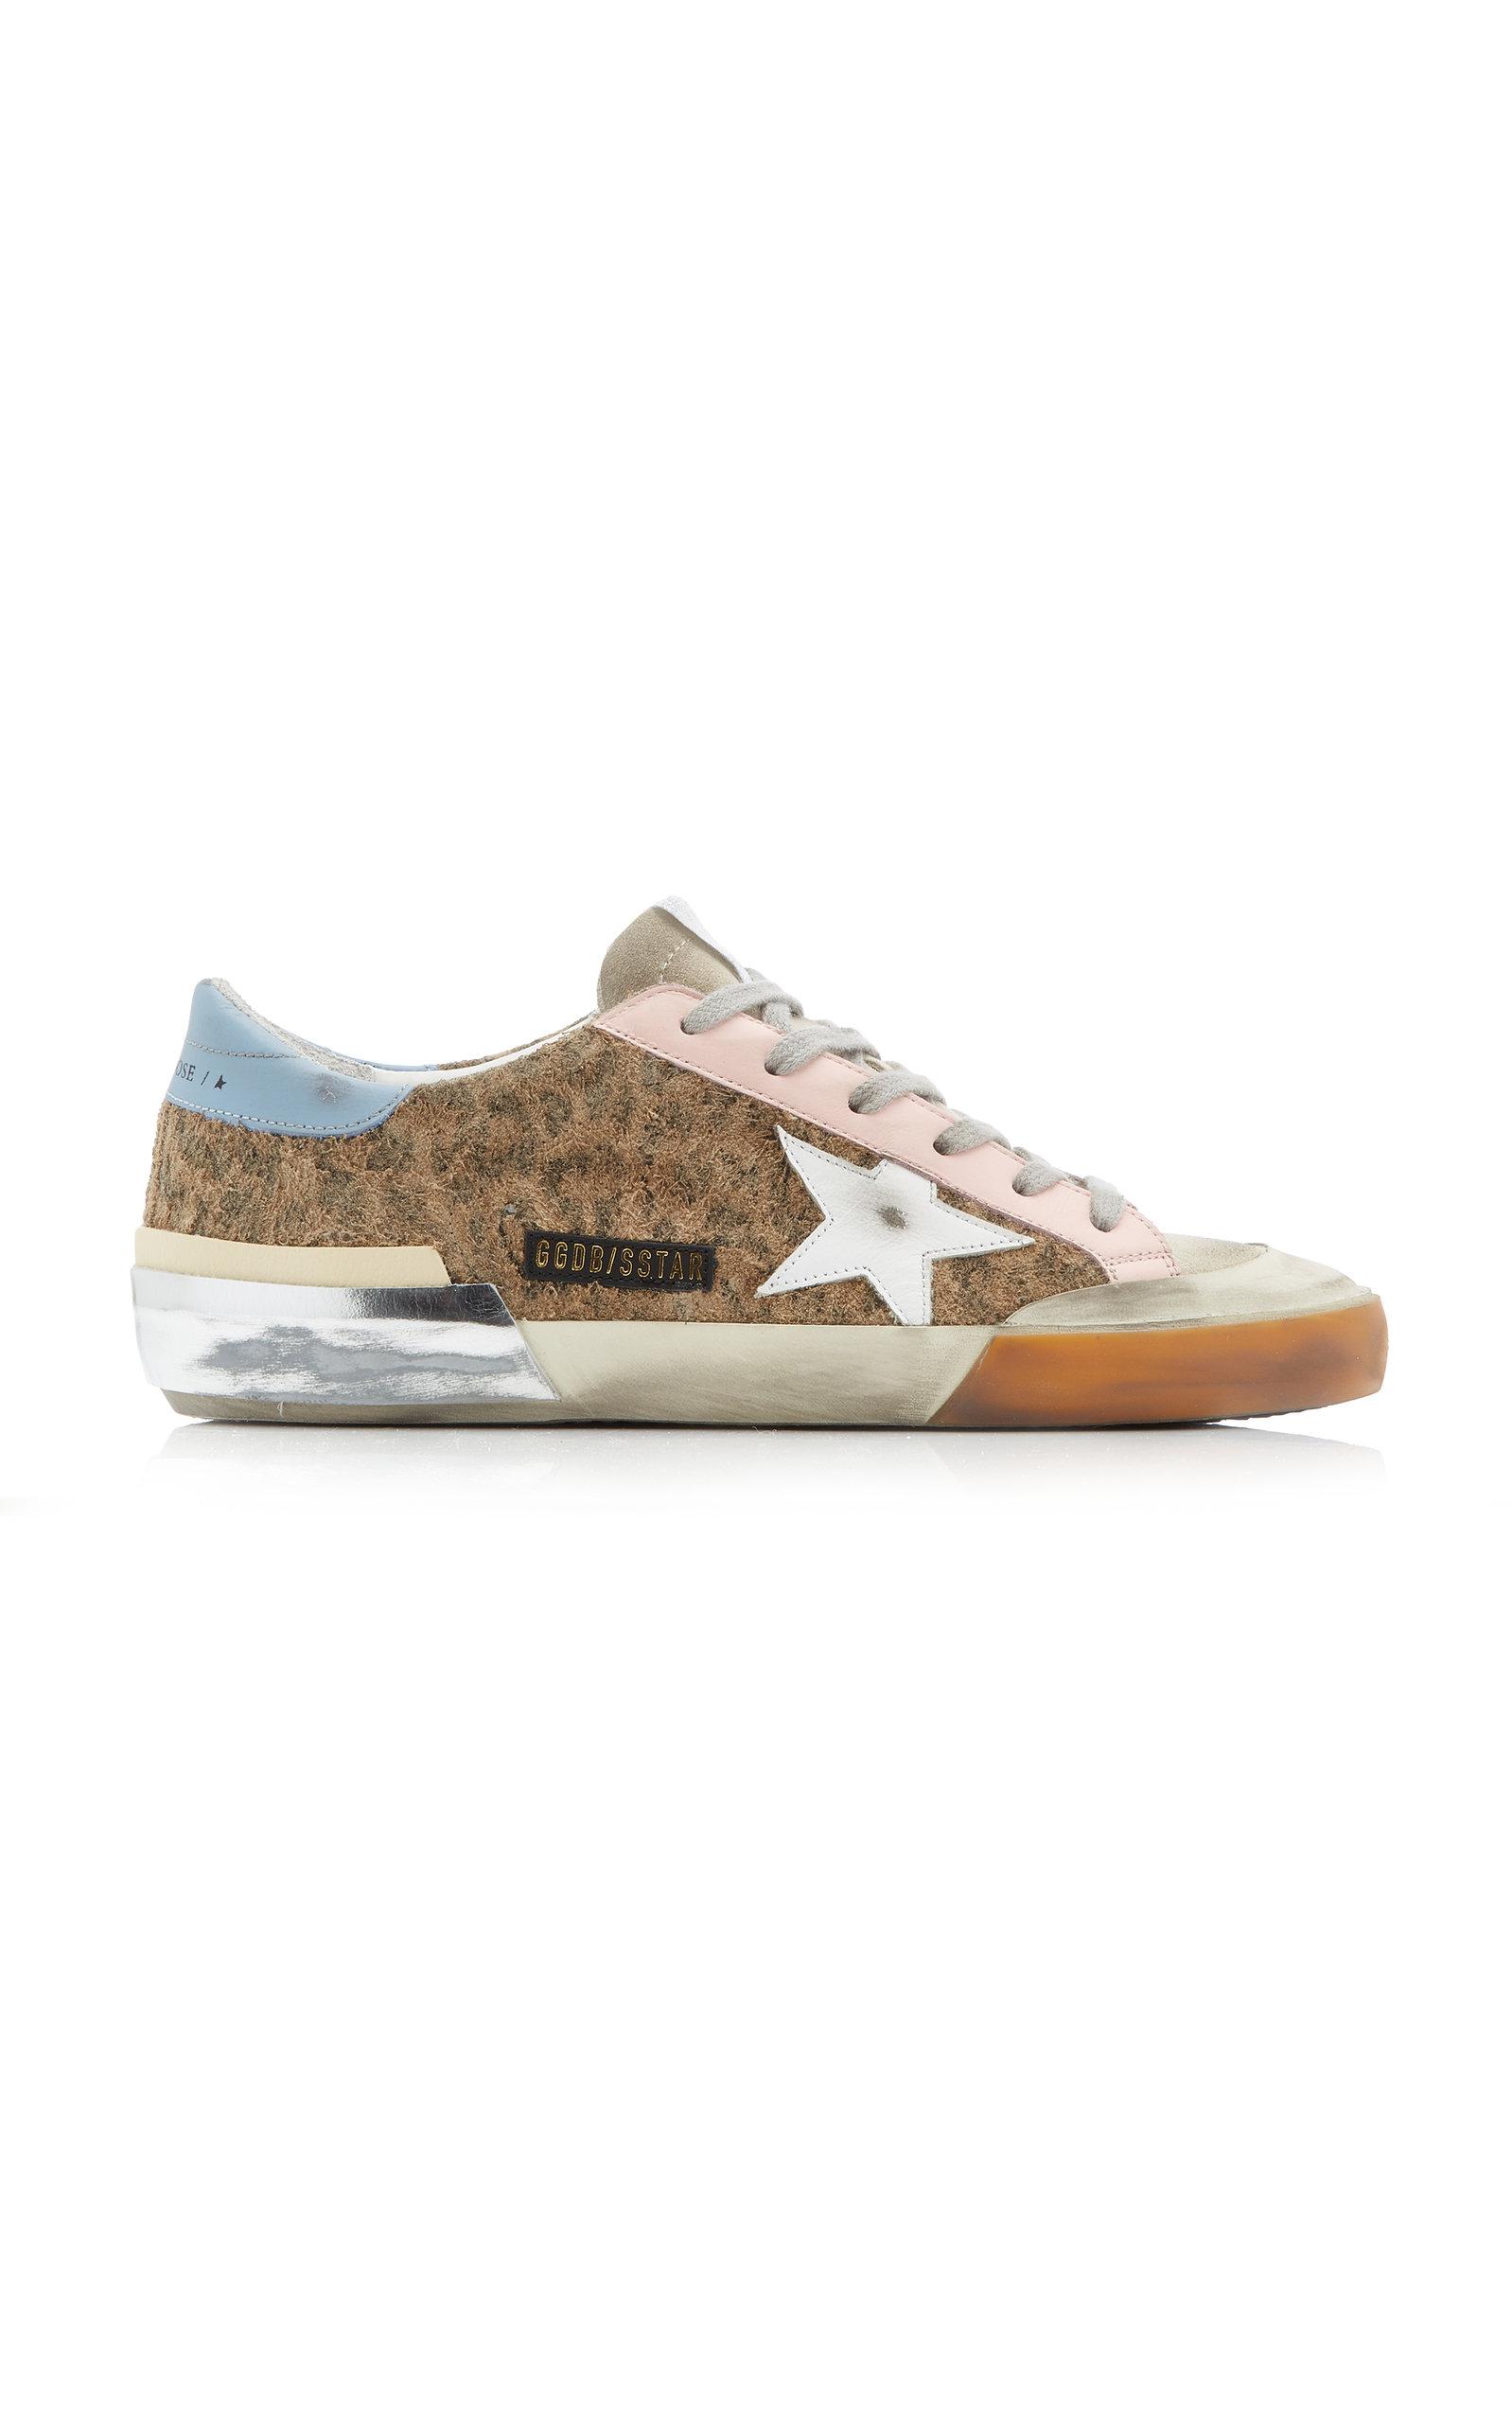 Golden Goose - Women's Super-Star Penstar Leopard-Print Suede and Leather Sneakers - Brown - Moda Operandi